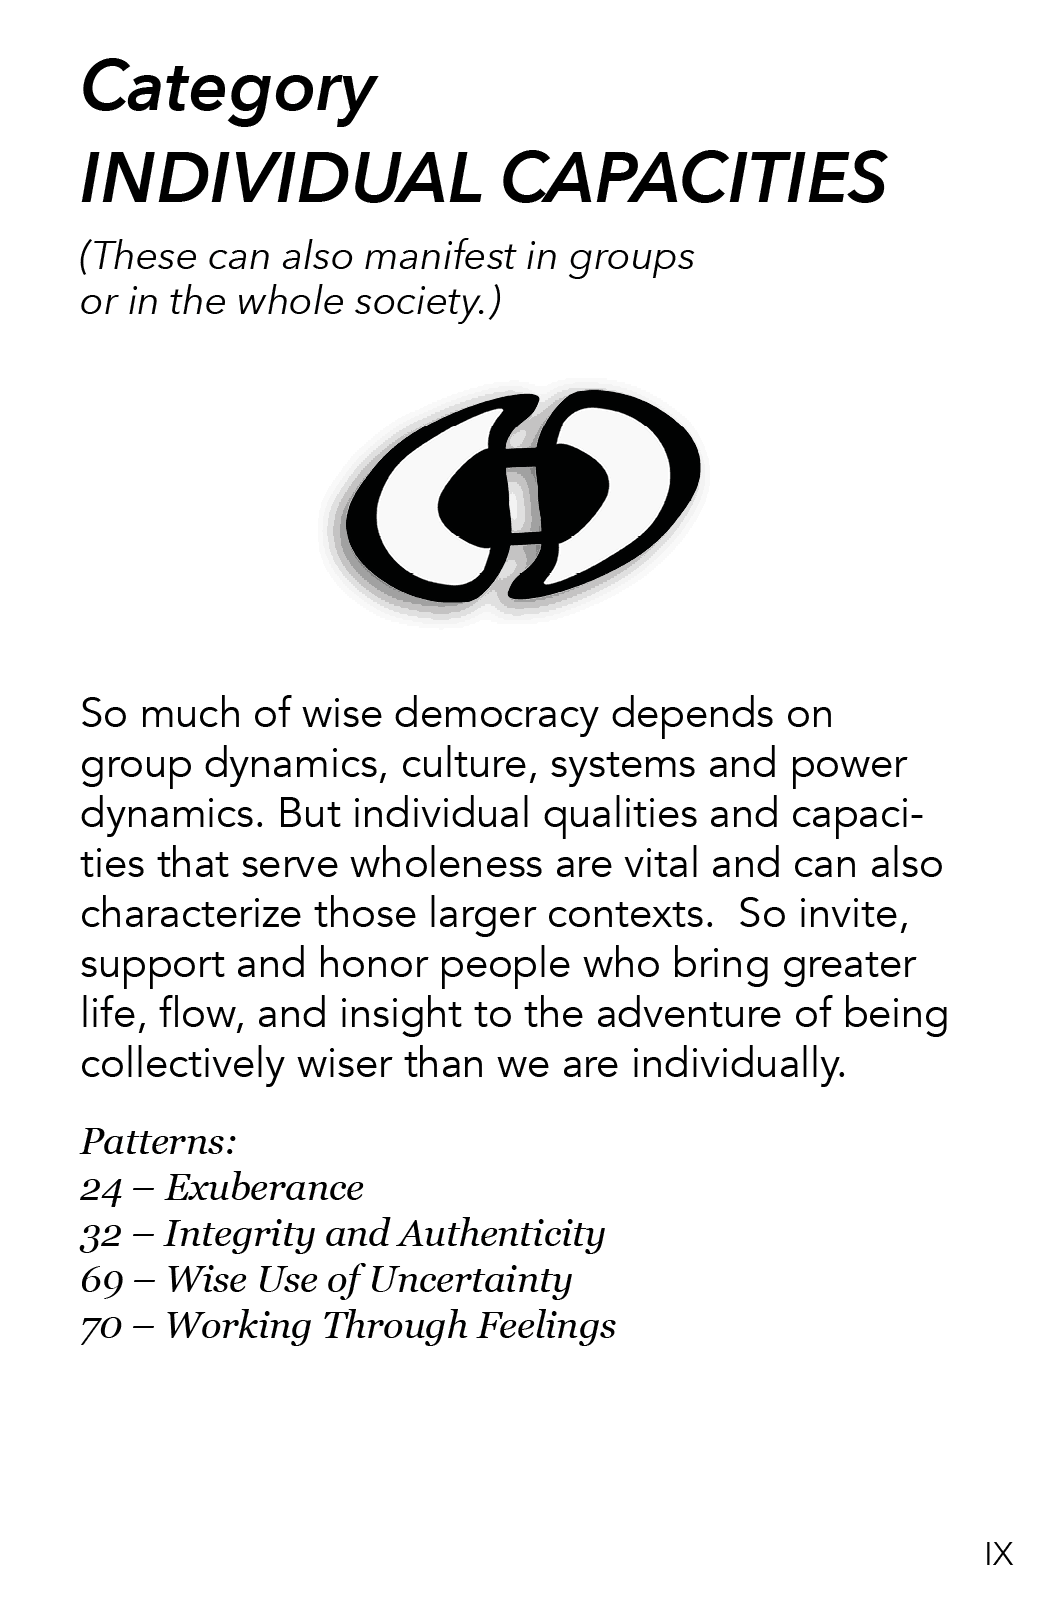 AA - 9 - Individual Capacities